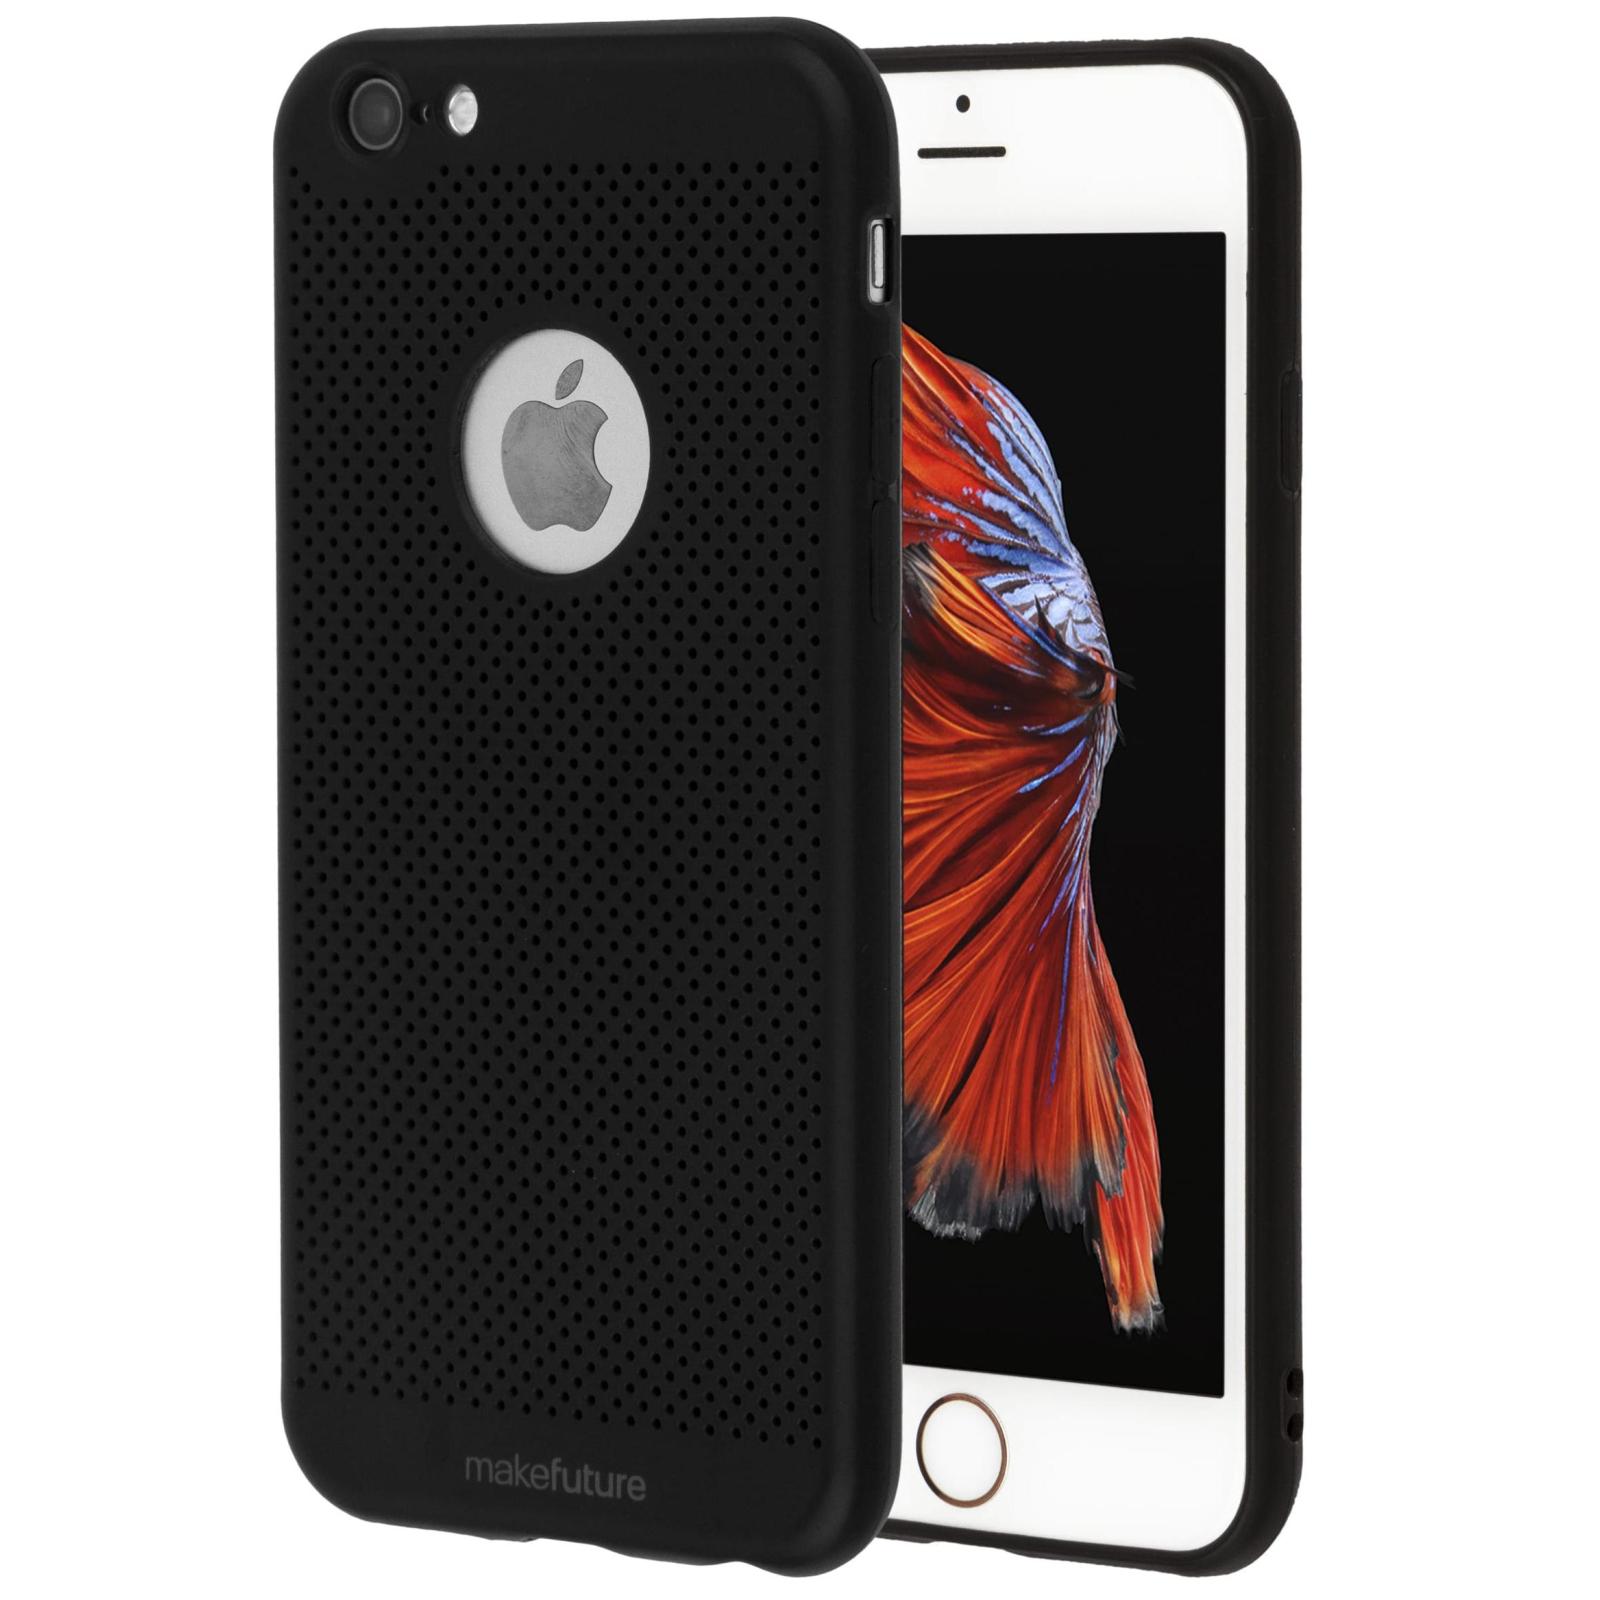 Чехол для моб. телефона MakeFuture Moon Case (TPU) для Apple iPhone 6 Black (MCM-AI6BK) изображение 2